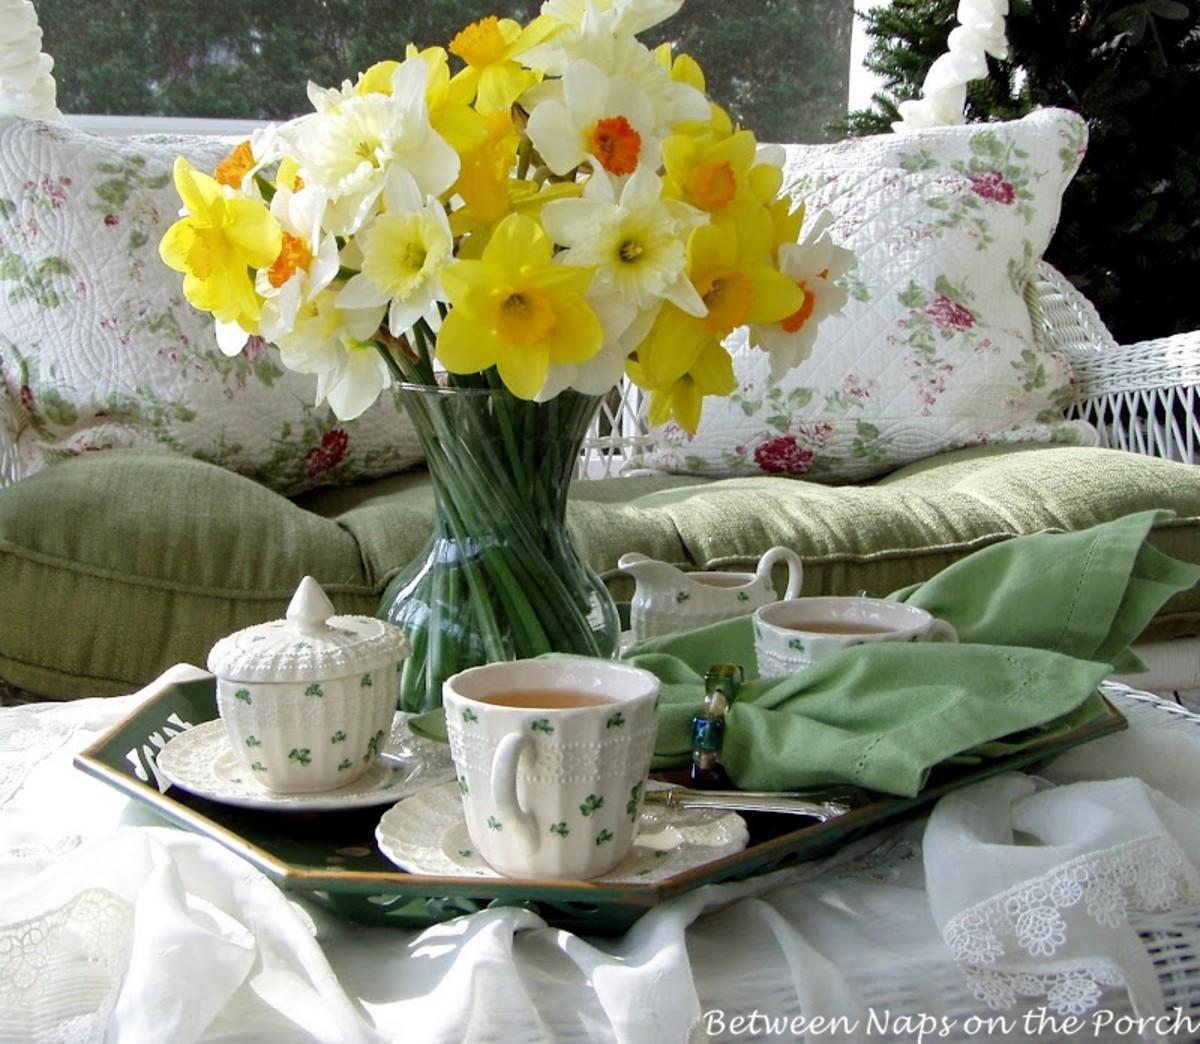 odonell-drinks-tea-on-st-patricks-day